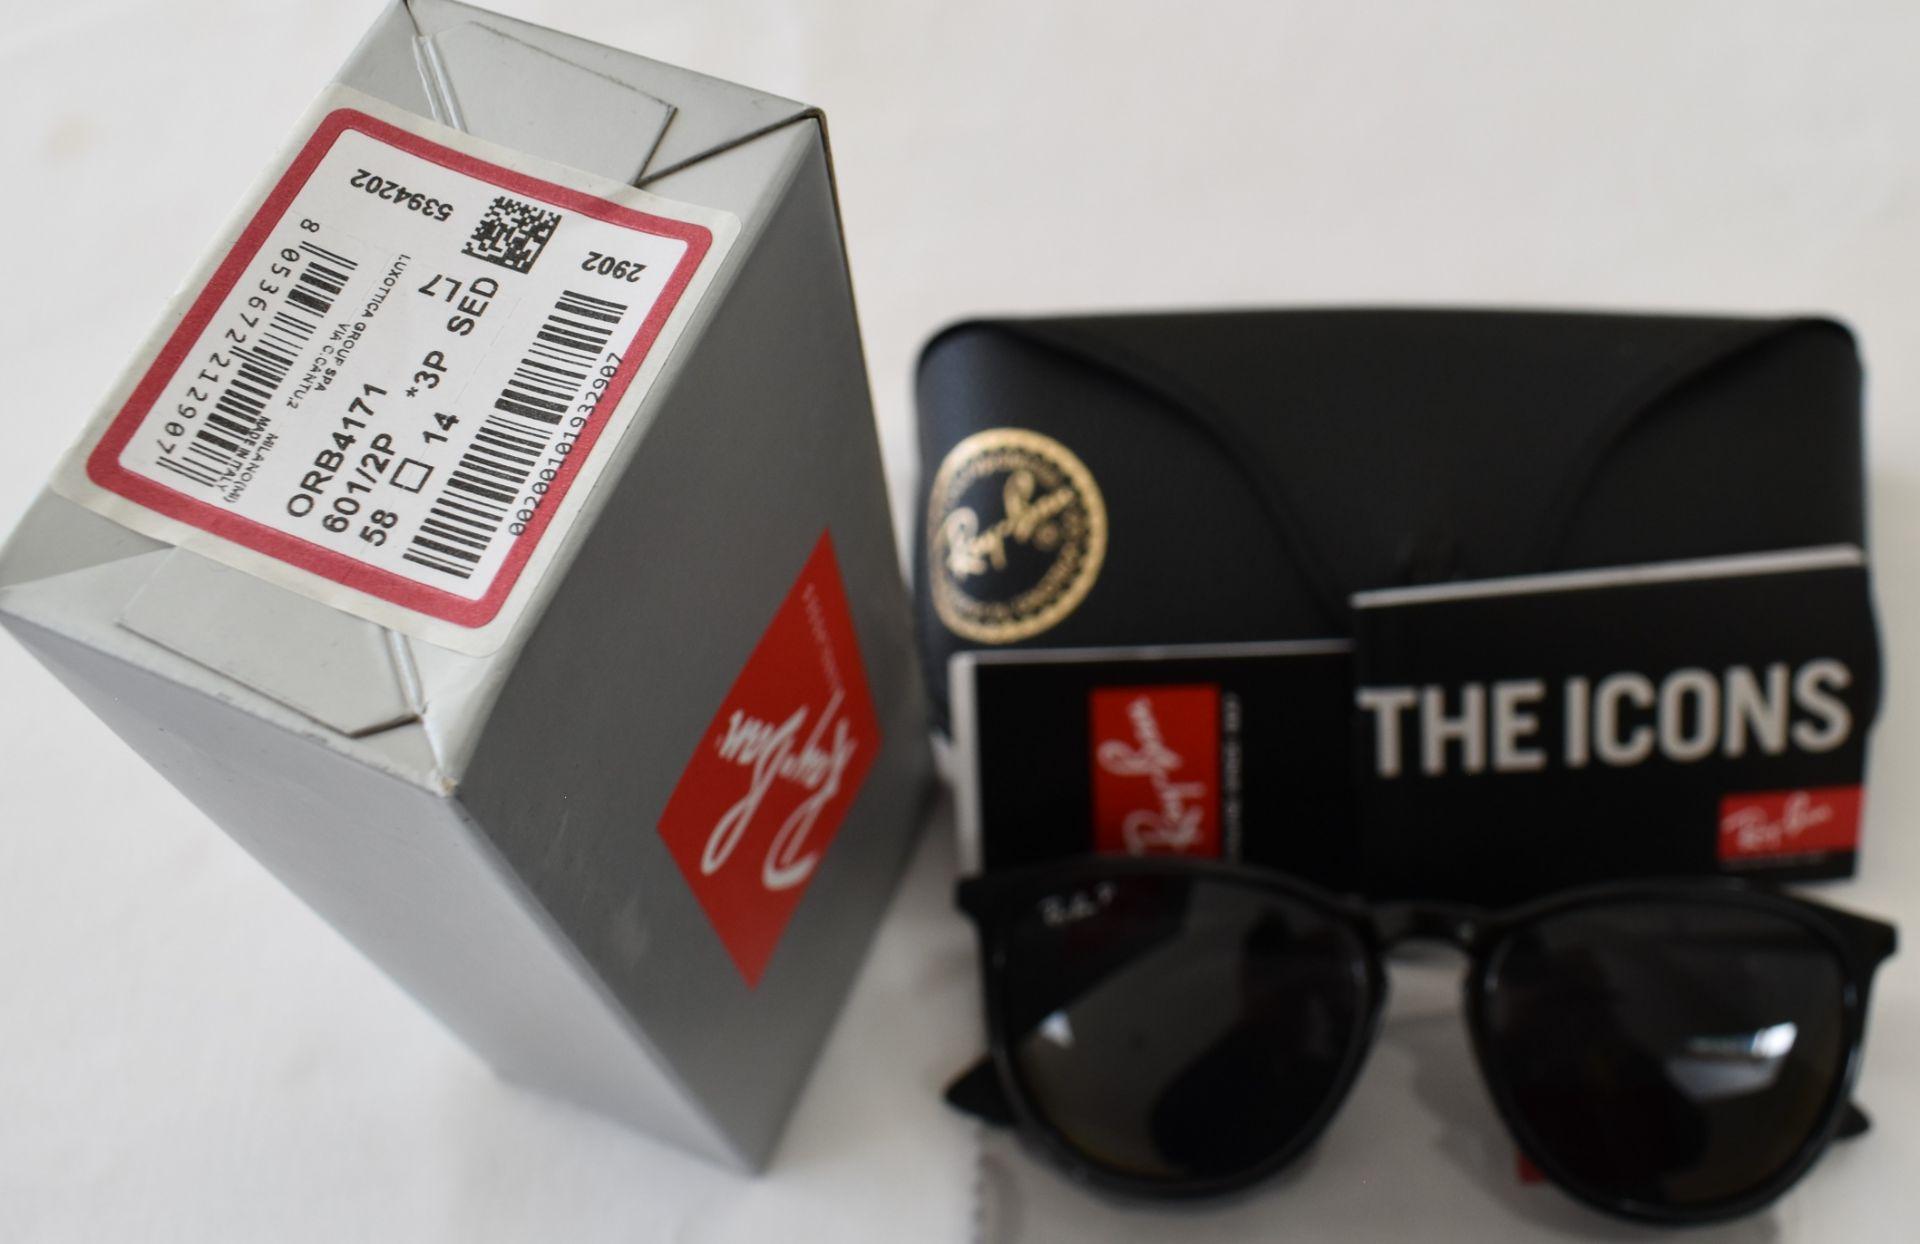 Ray Ban Sunglasses ORB4171 601/2P *3P - Image 2 of 2